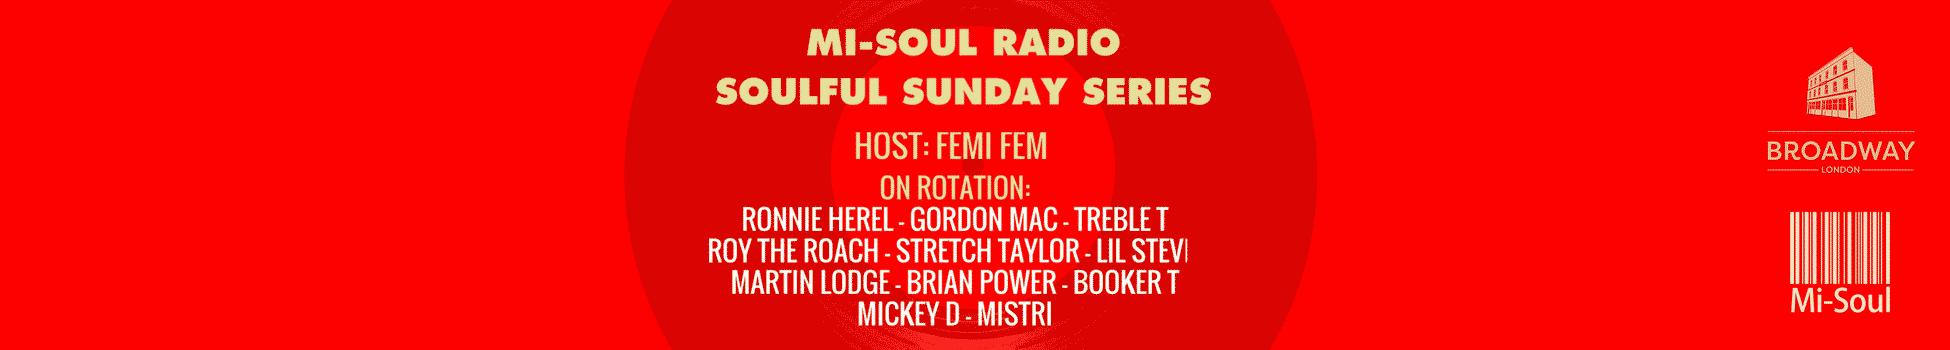 Mi-Soul Radio Soulful Sunday Series